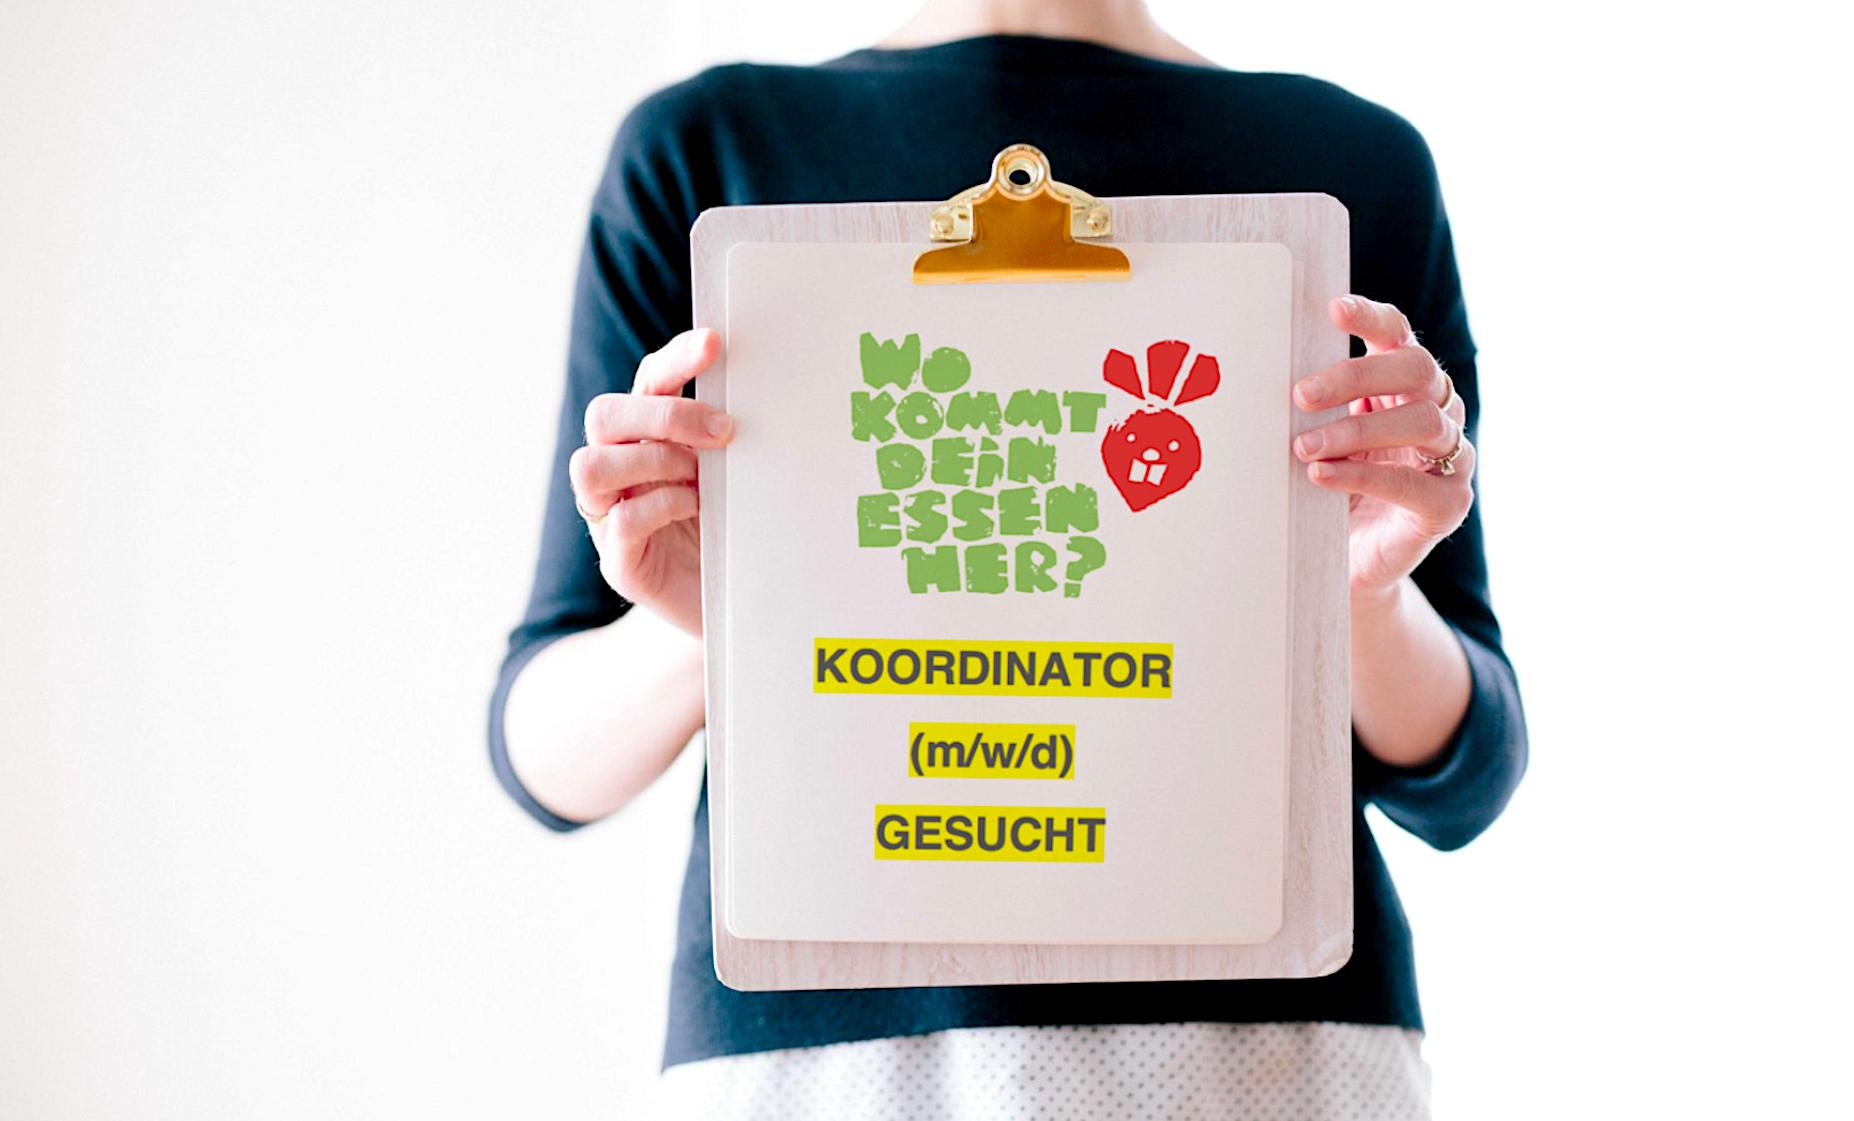 https://www.vdskc.de/wp-content/uploads/2021/10/Koordinator-gesucht.png